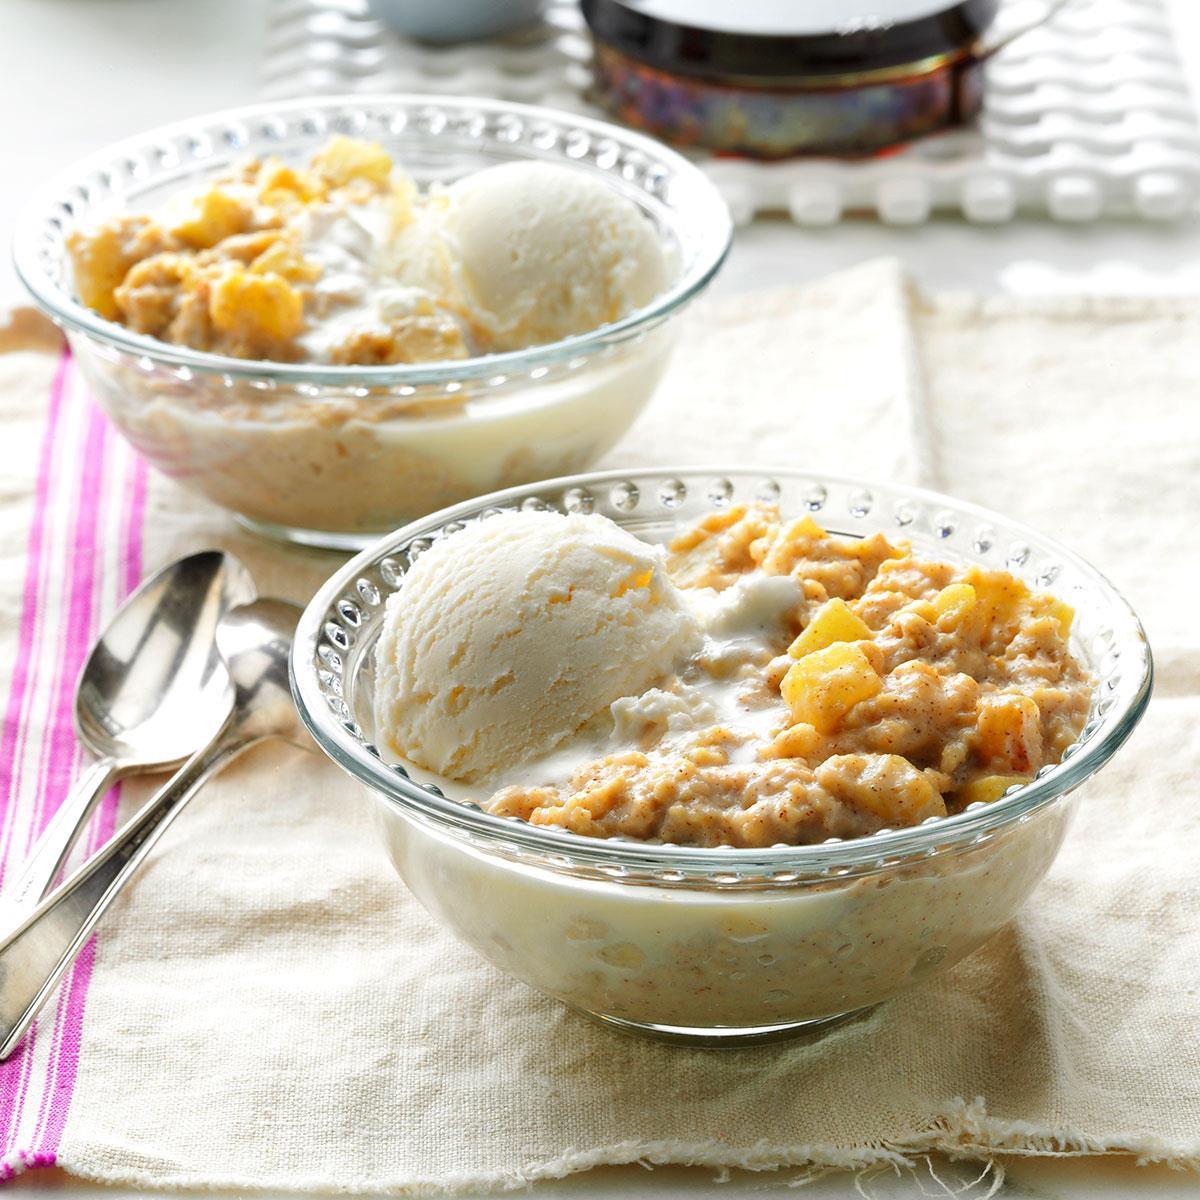 Oatmeal Dessert Recipe  Apple Pie Oatmeal Dessert Recipe